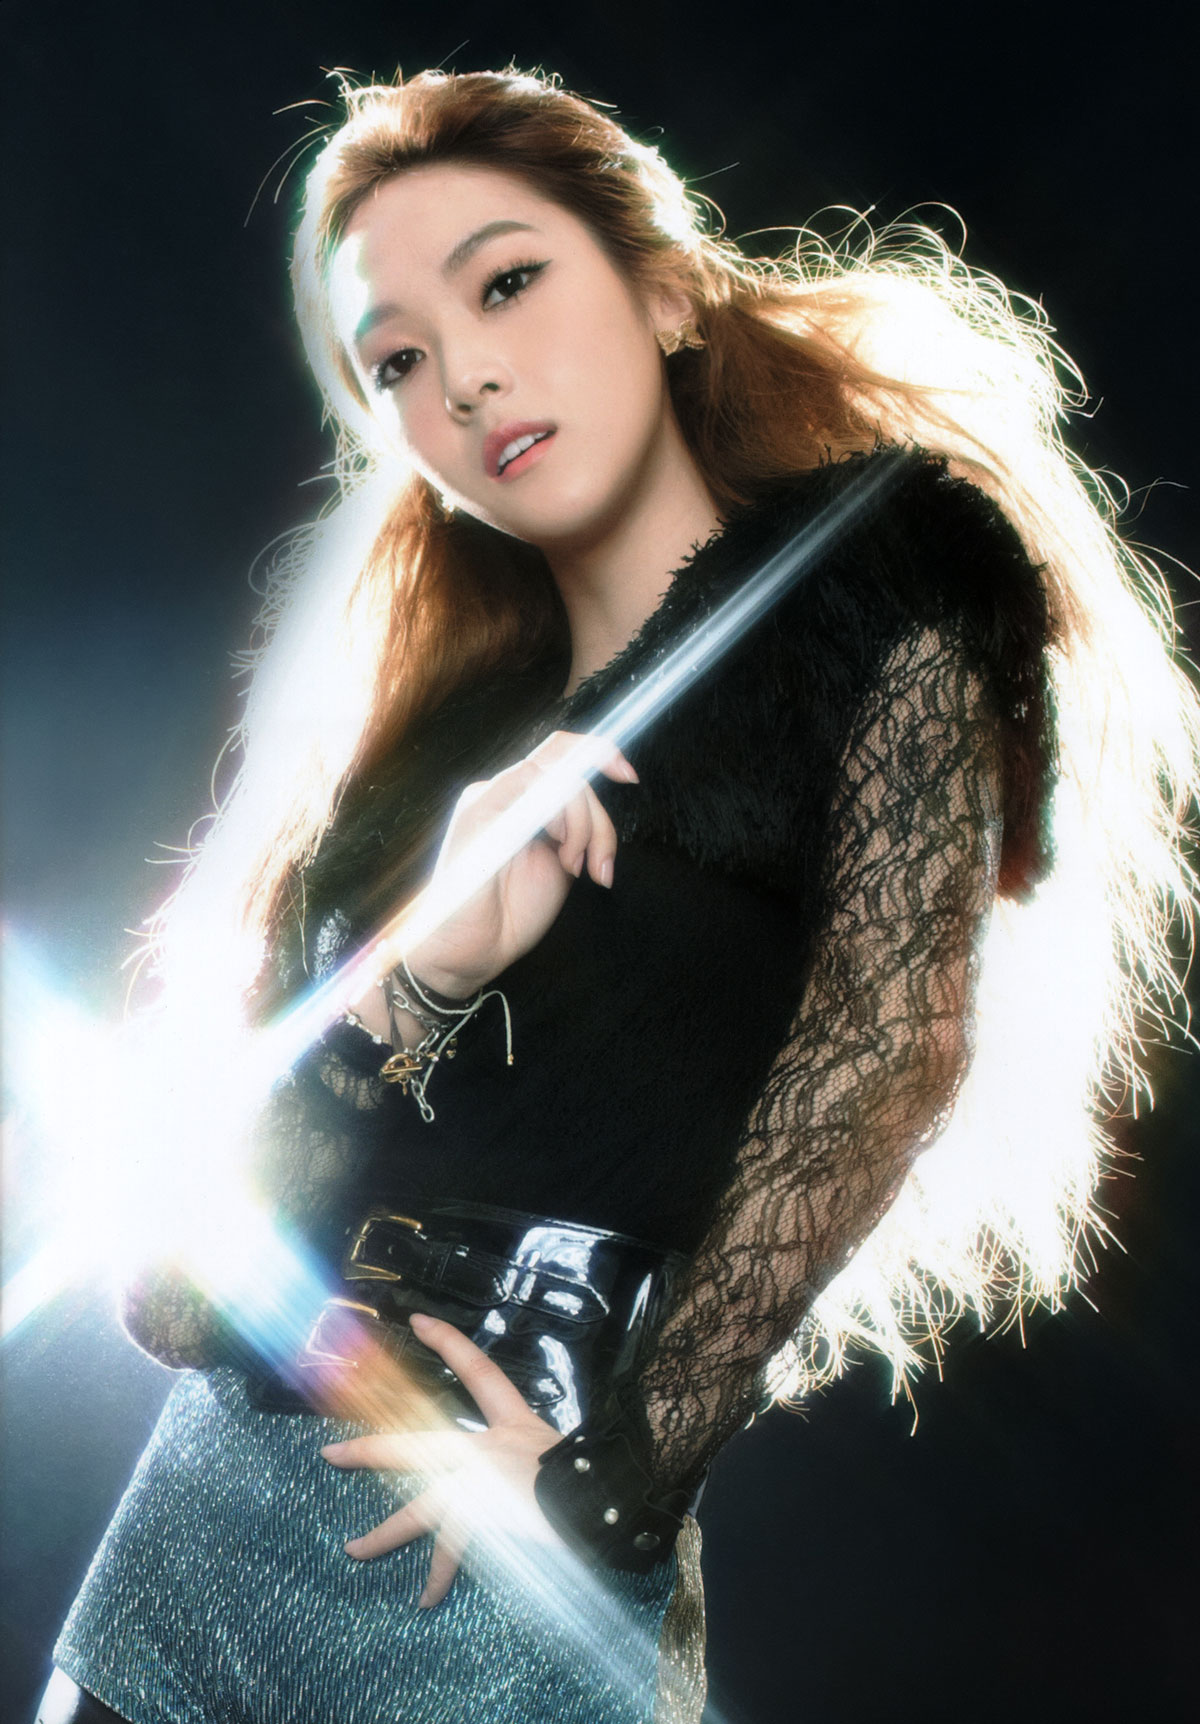 Jessica Girls Generation 2011 Tour brochure